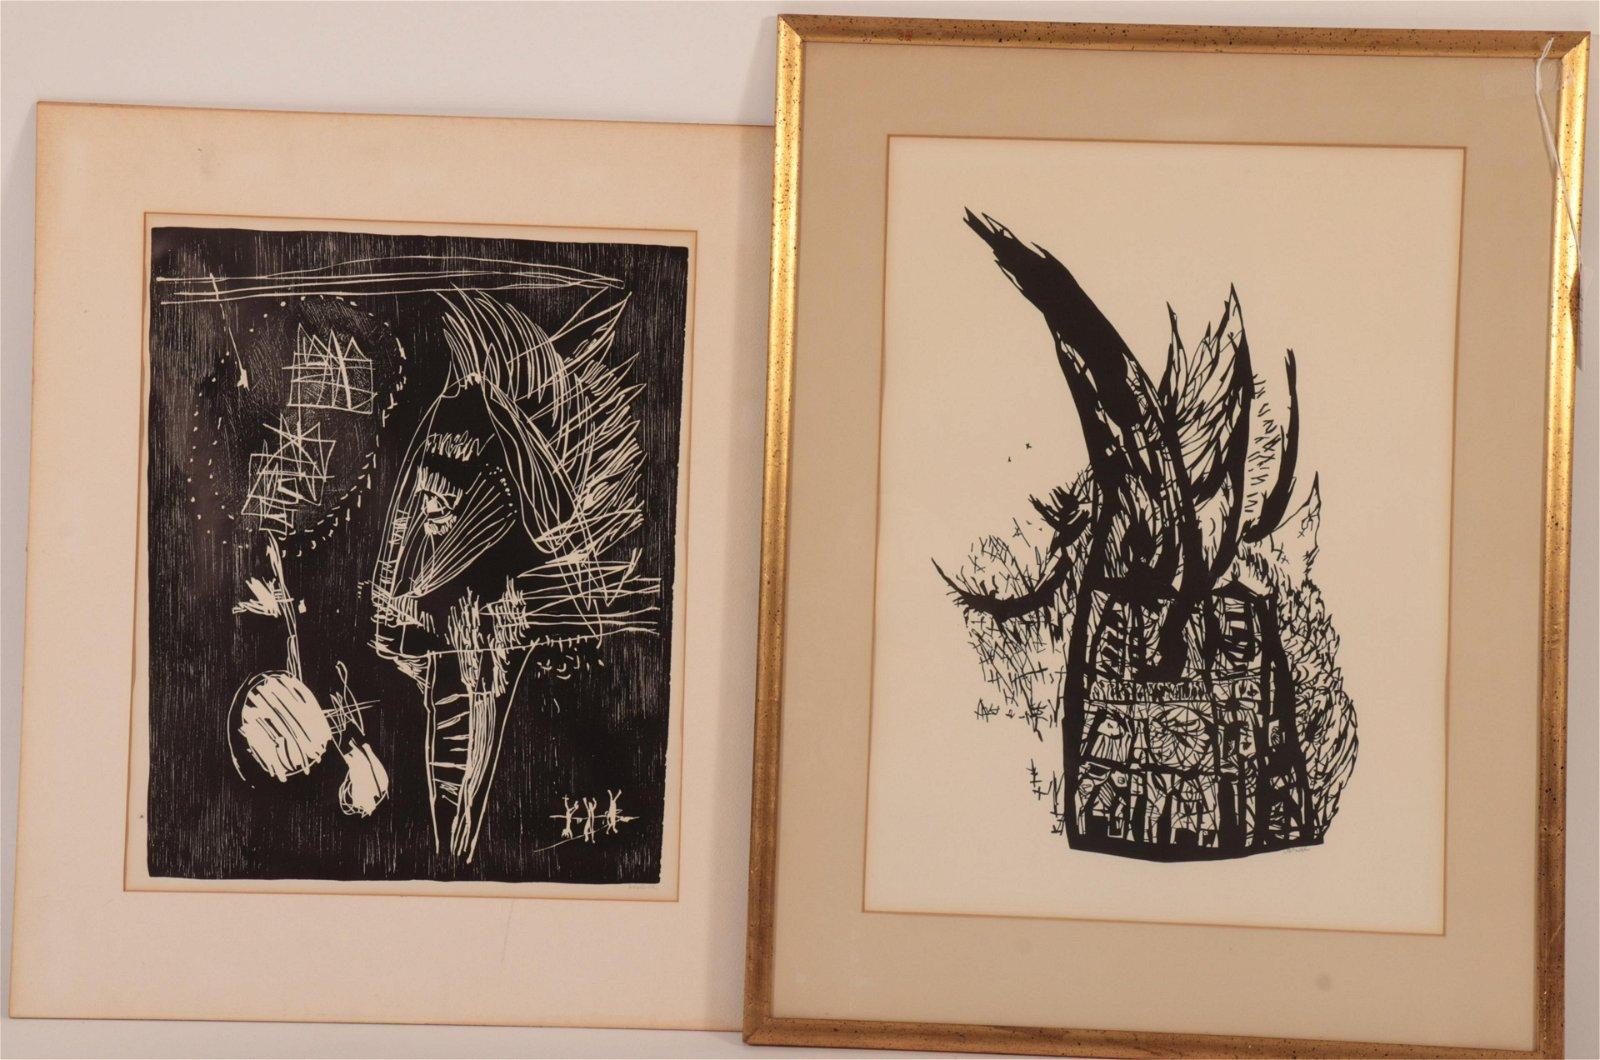 2 Arno Vihalemm (1911-1919) Woodblock Prints